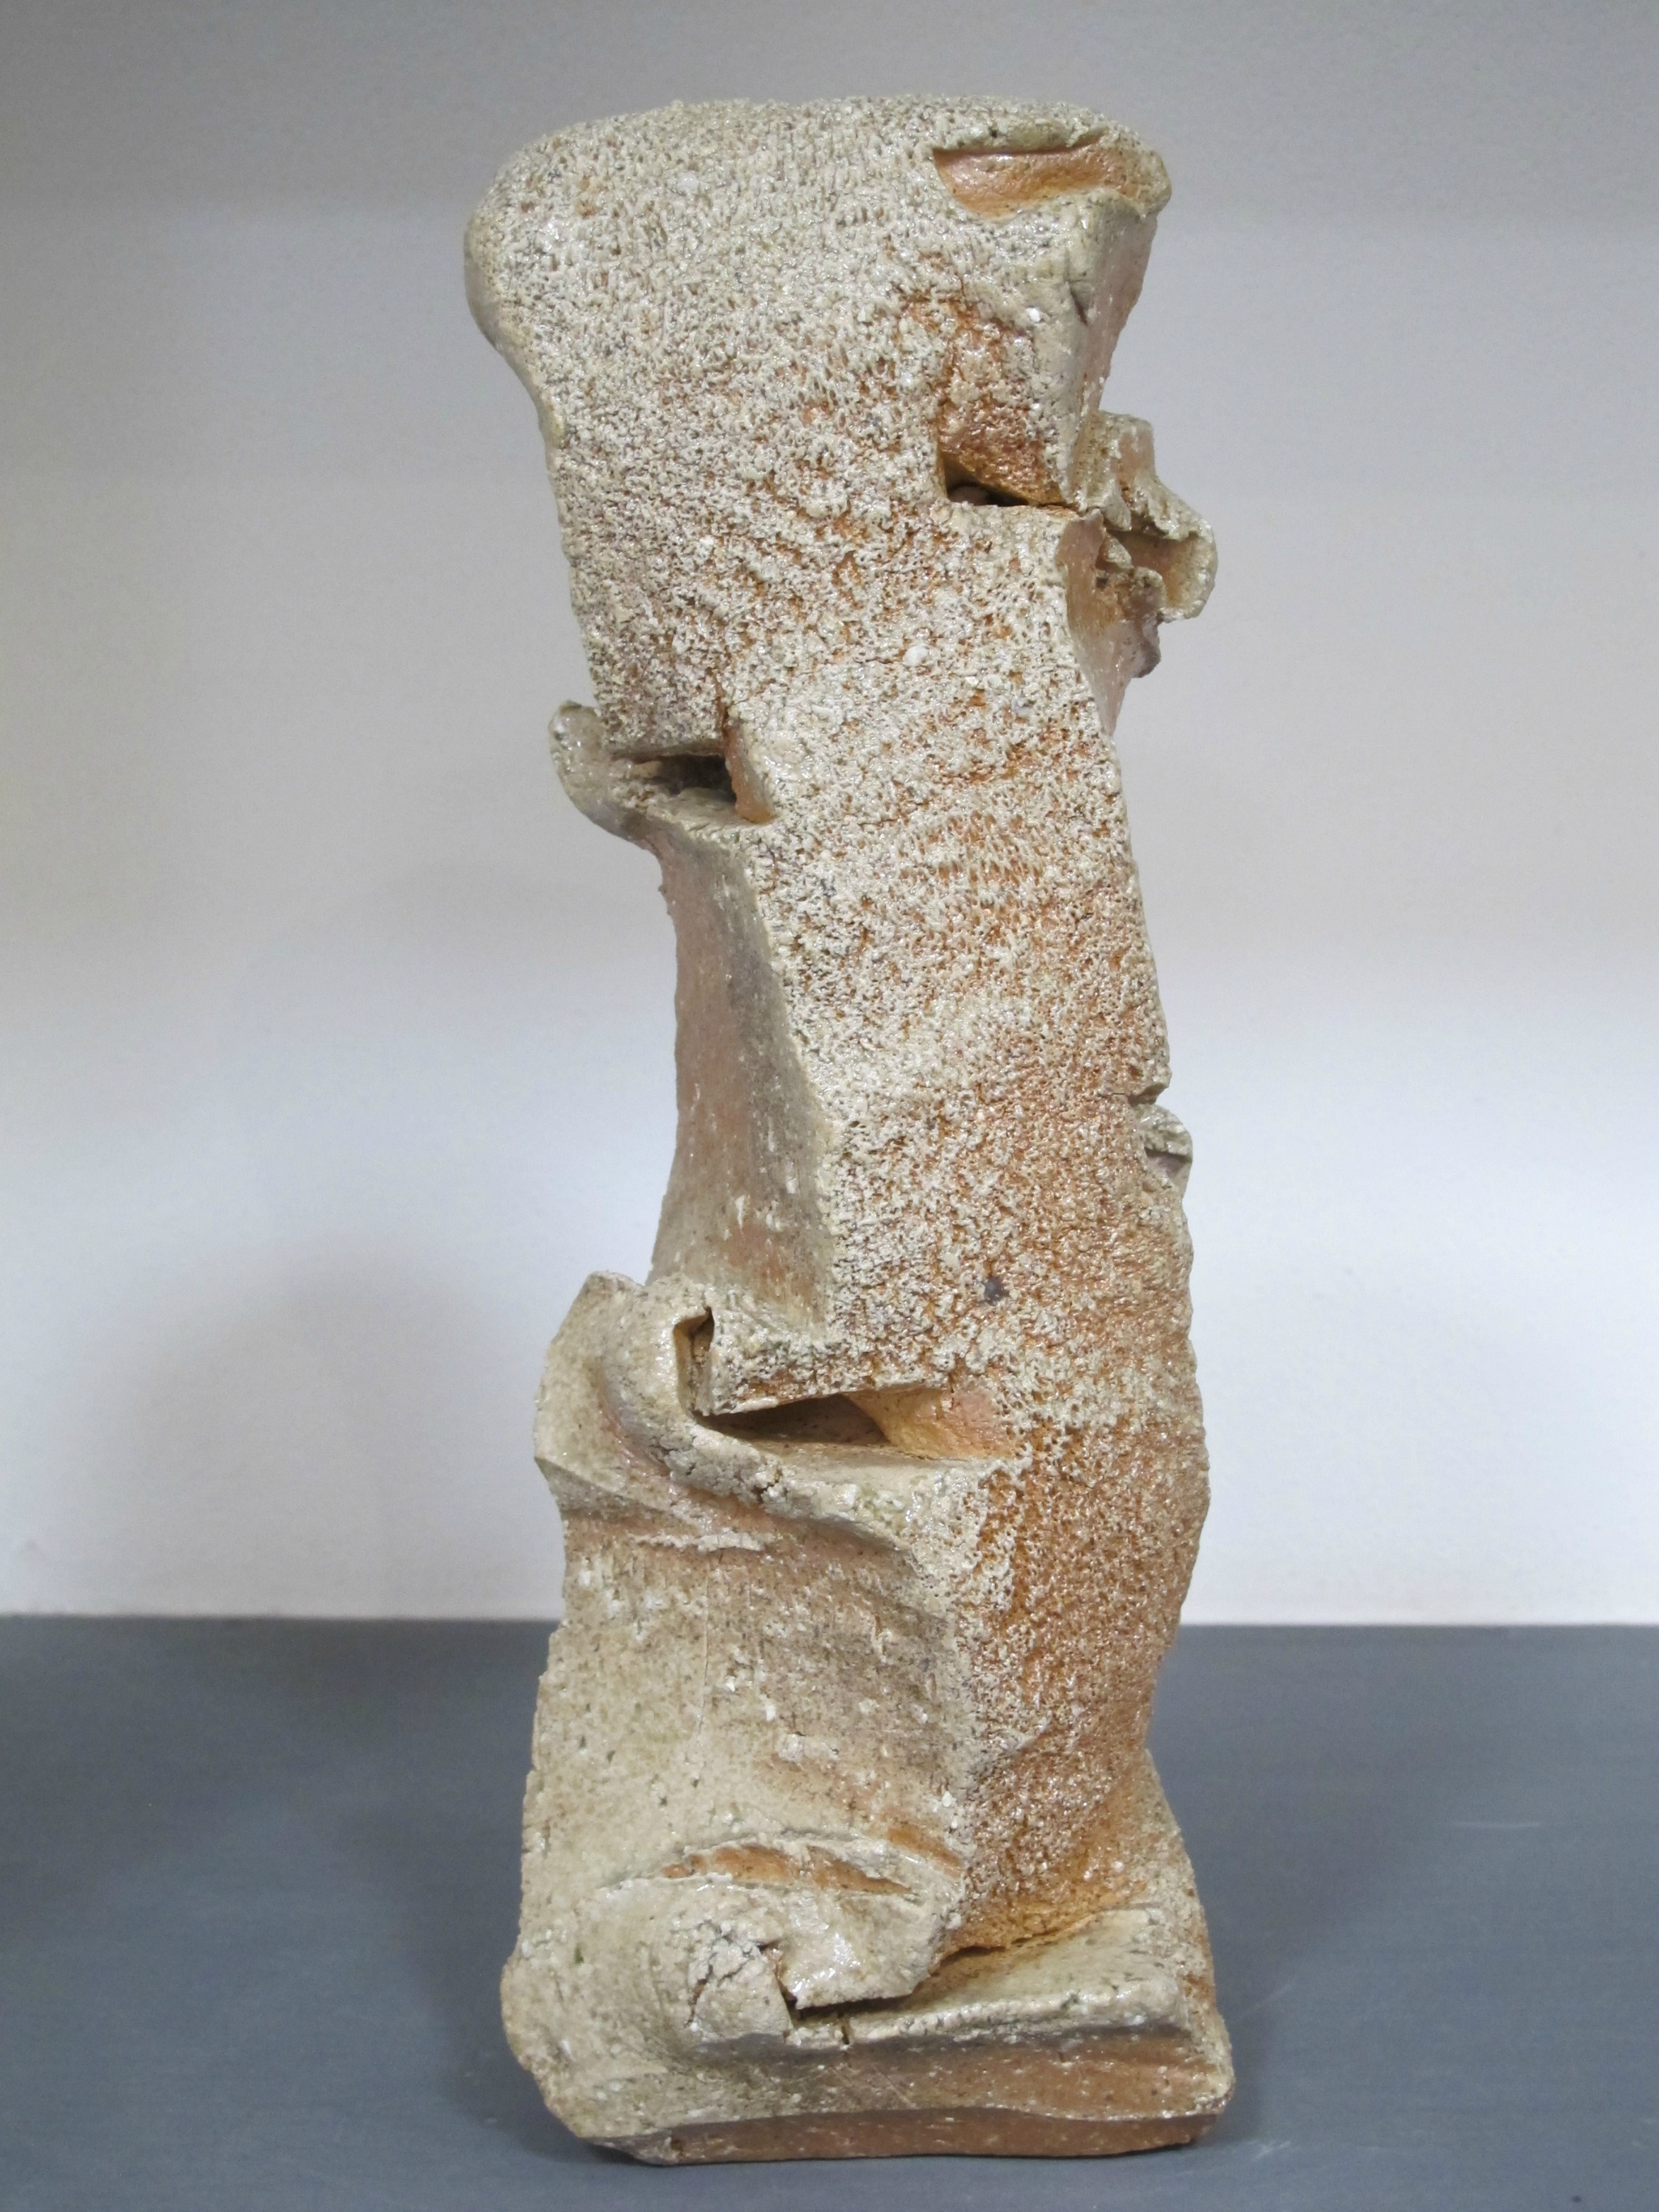 Ceramic by Shozo Michicawa, Photo by Cristina Solano.